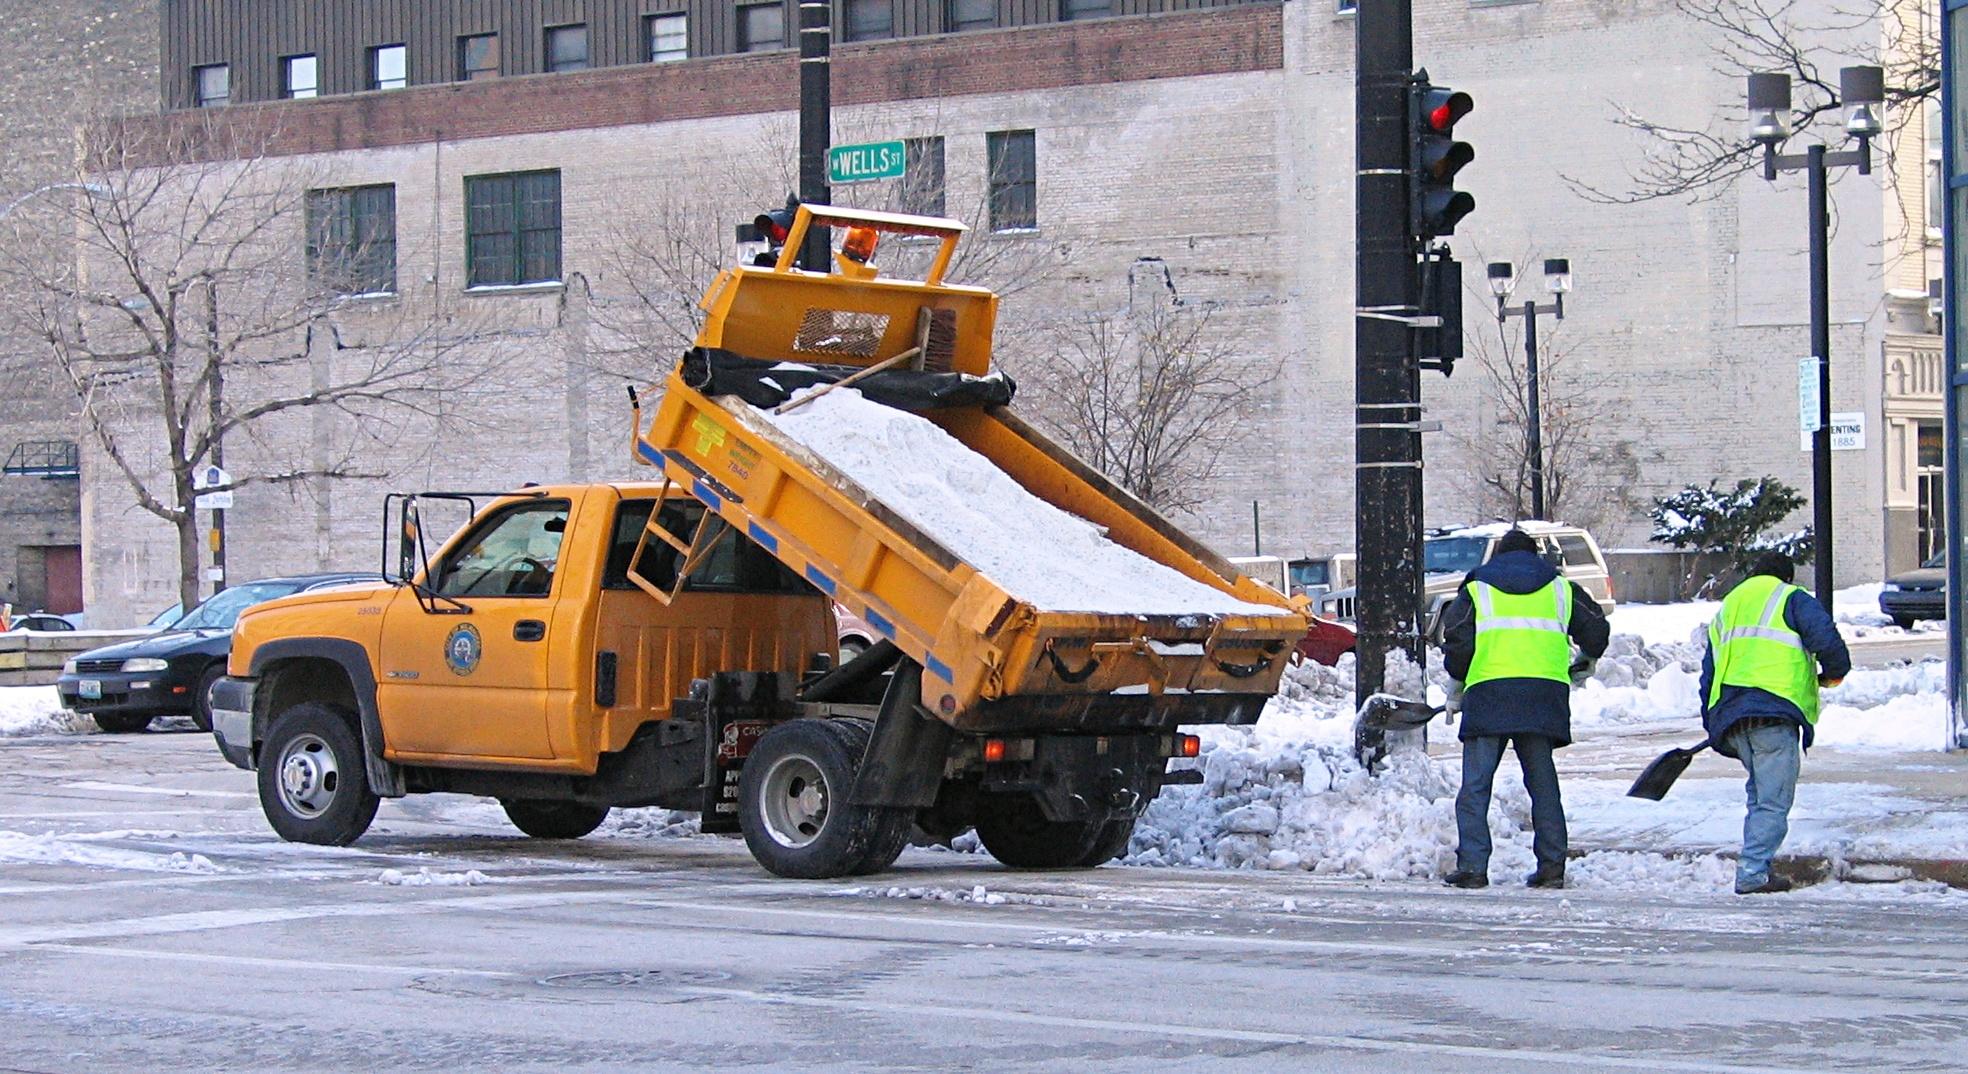 Salt_truck_Milwaukee.jpg